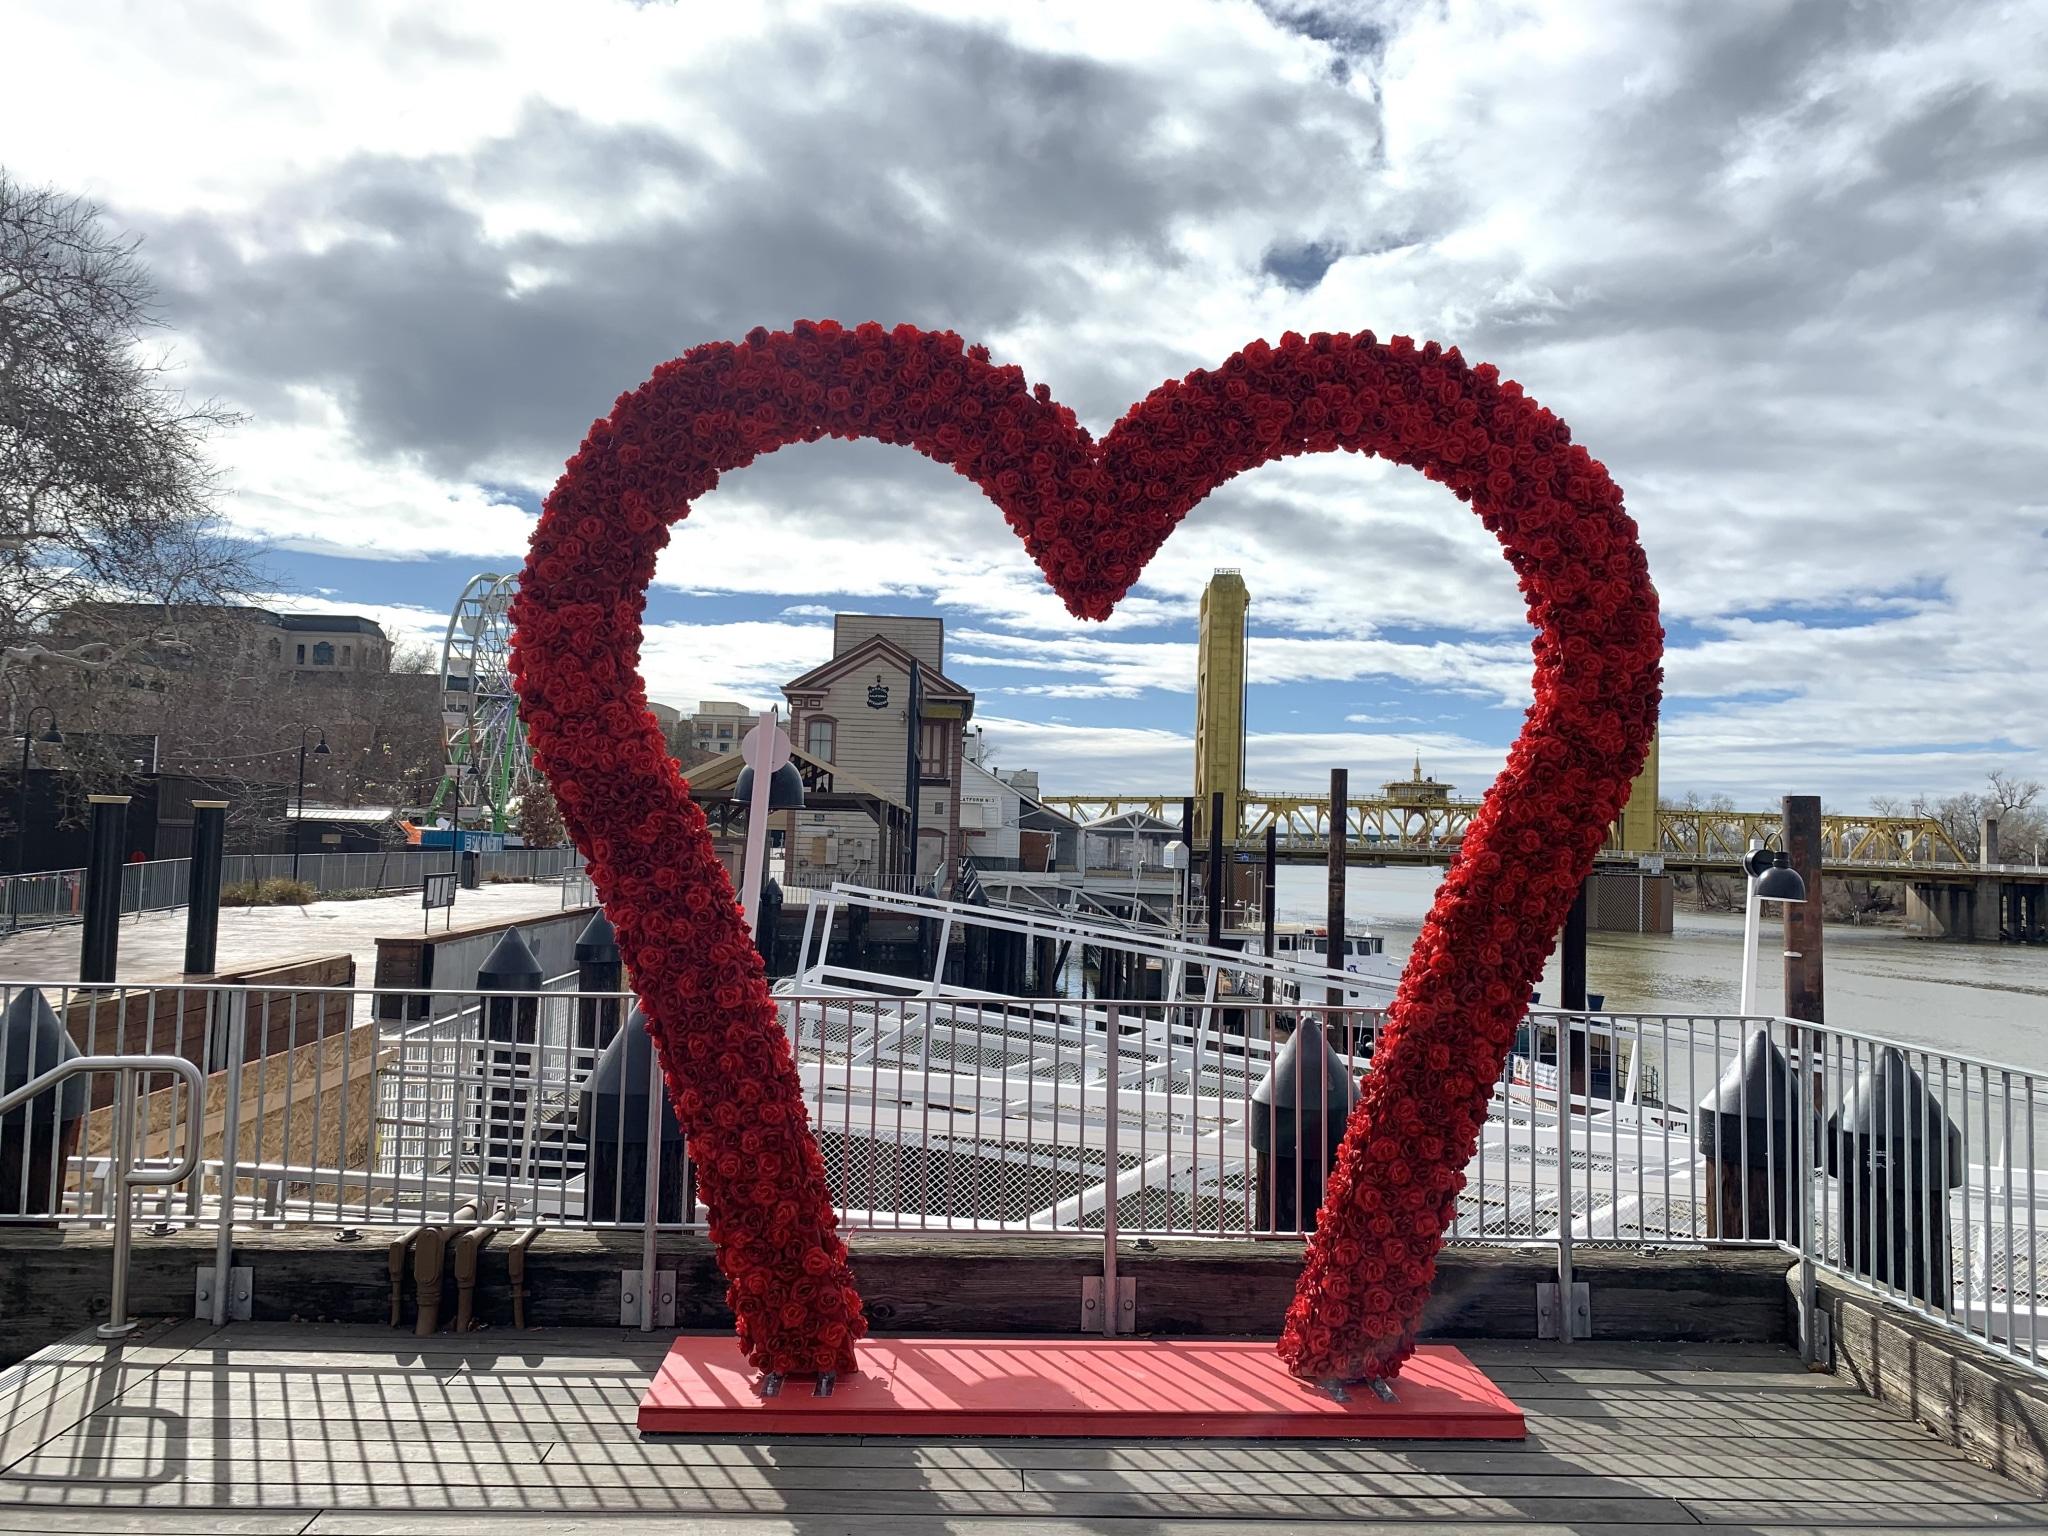 10′ Heart Arch Installed at the Old Sacramento Waterfront via @sacramentopress